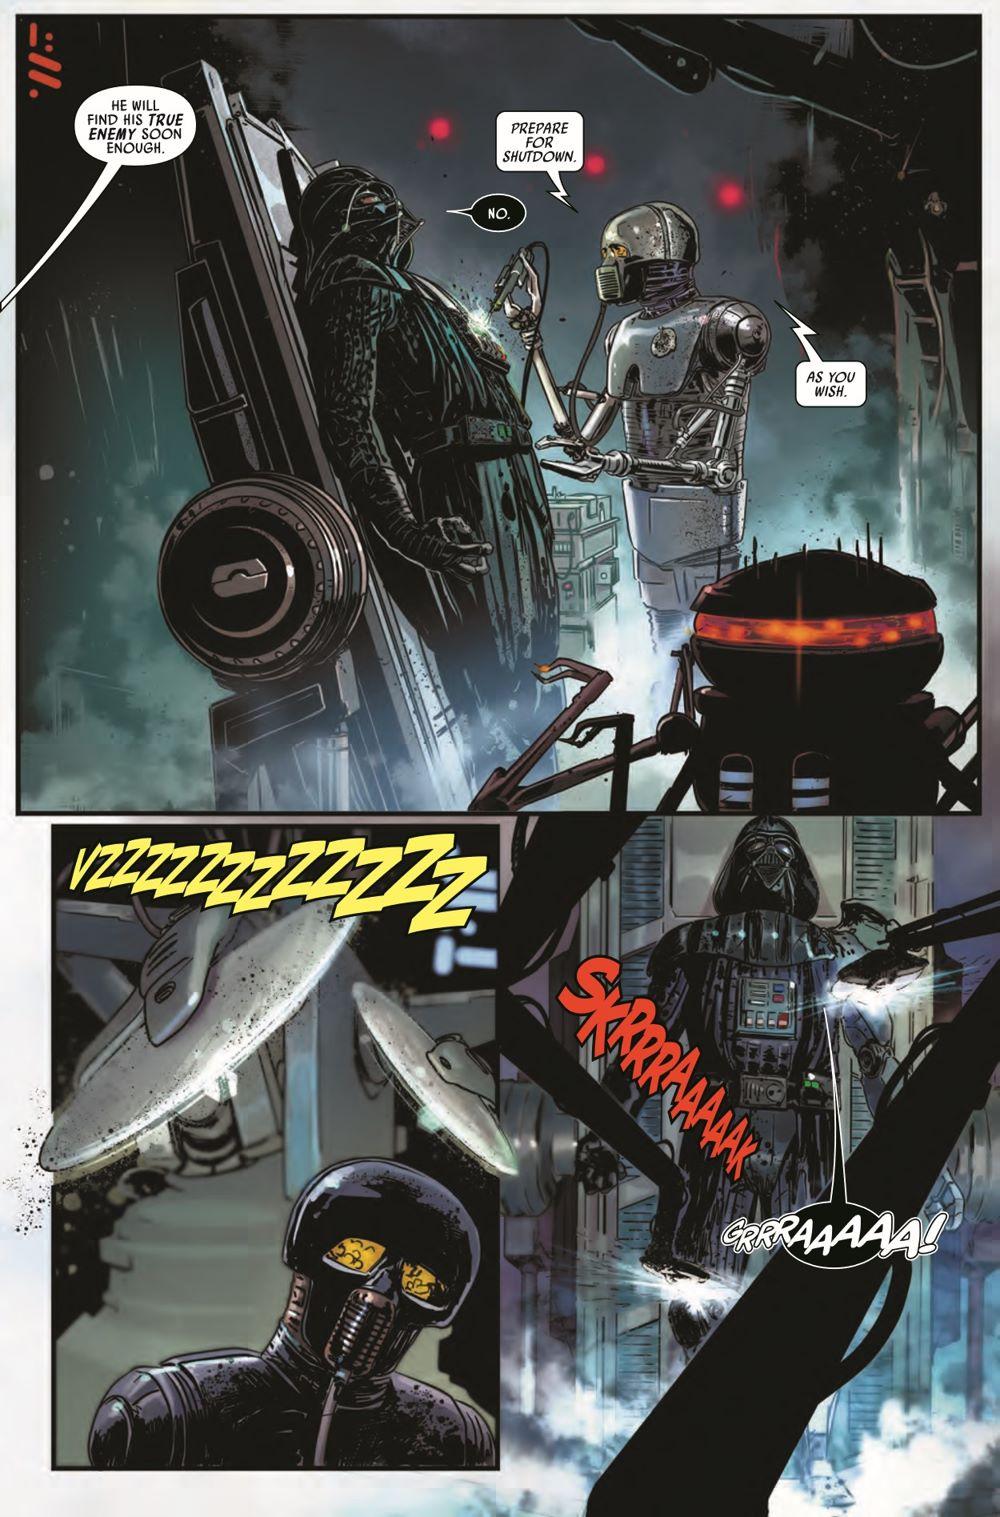 STWVADER2020012_Preview-5 ComicList Previews: STAR WARS DARTH VADER #12